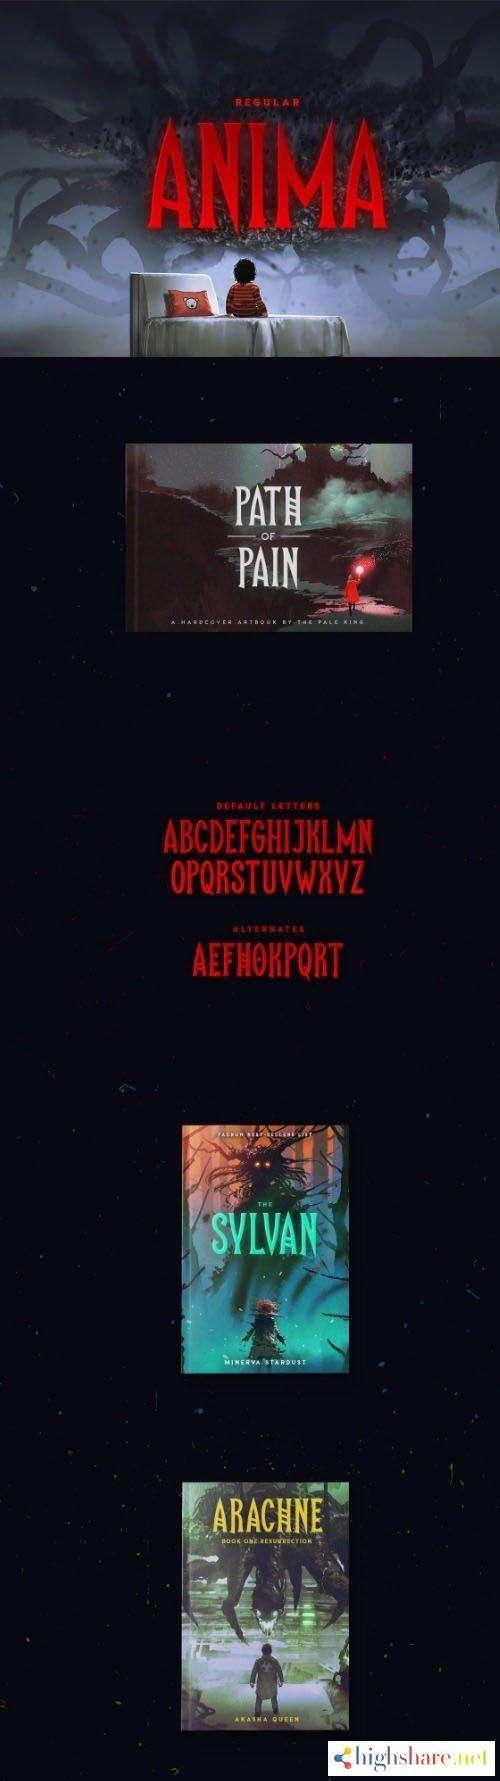 anima regular font 5f43b2a65834a - Anima Regular Font